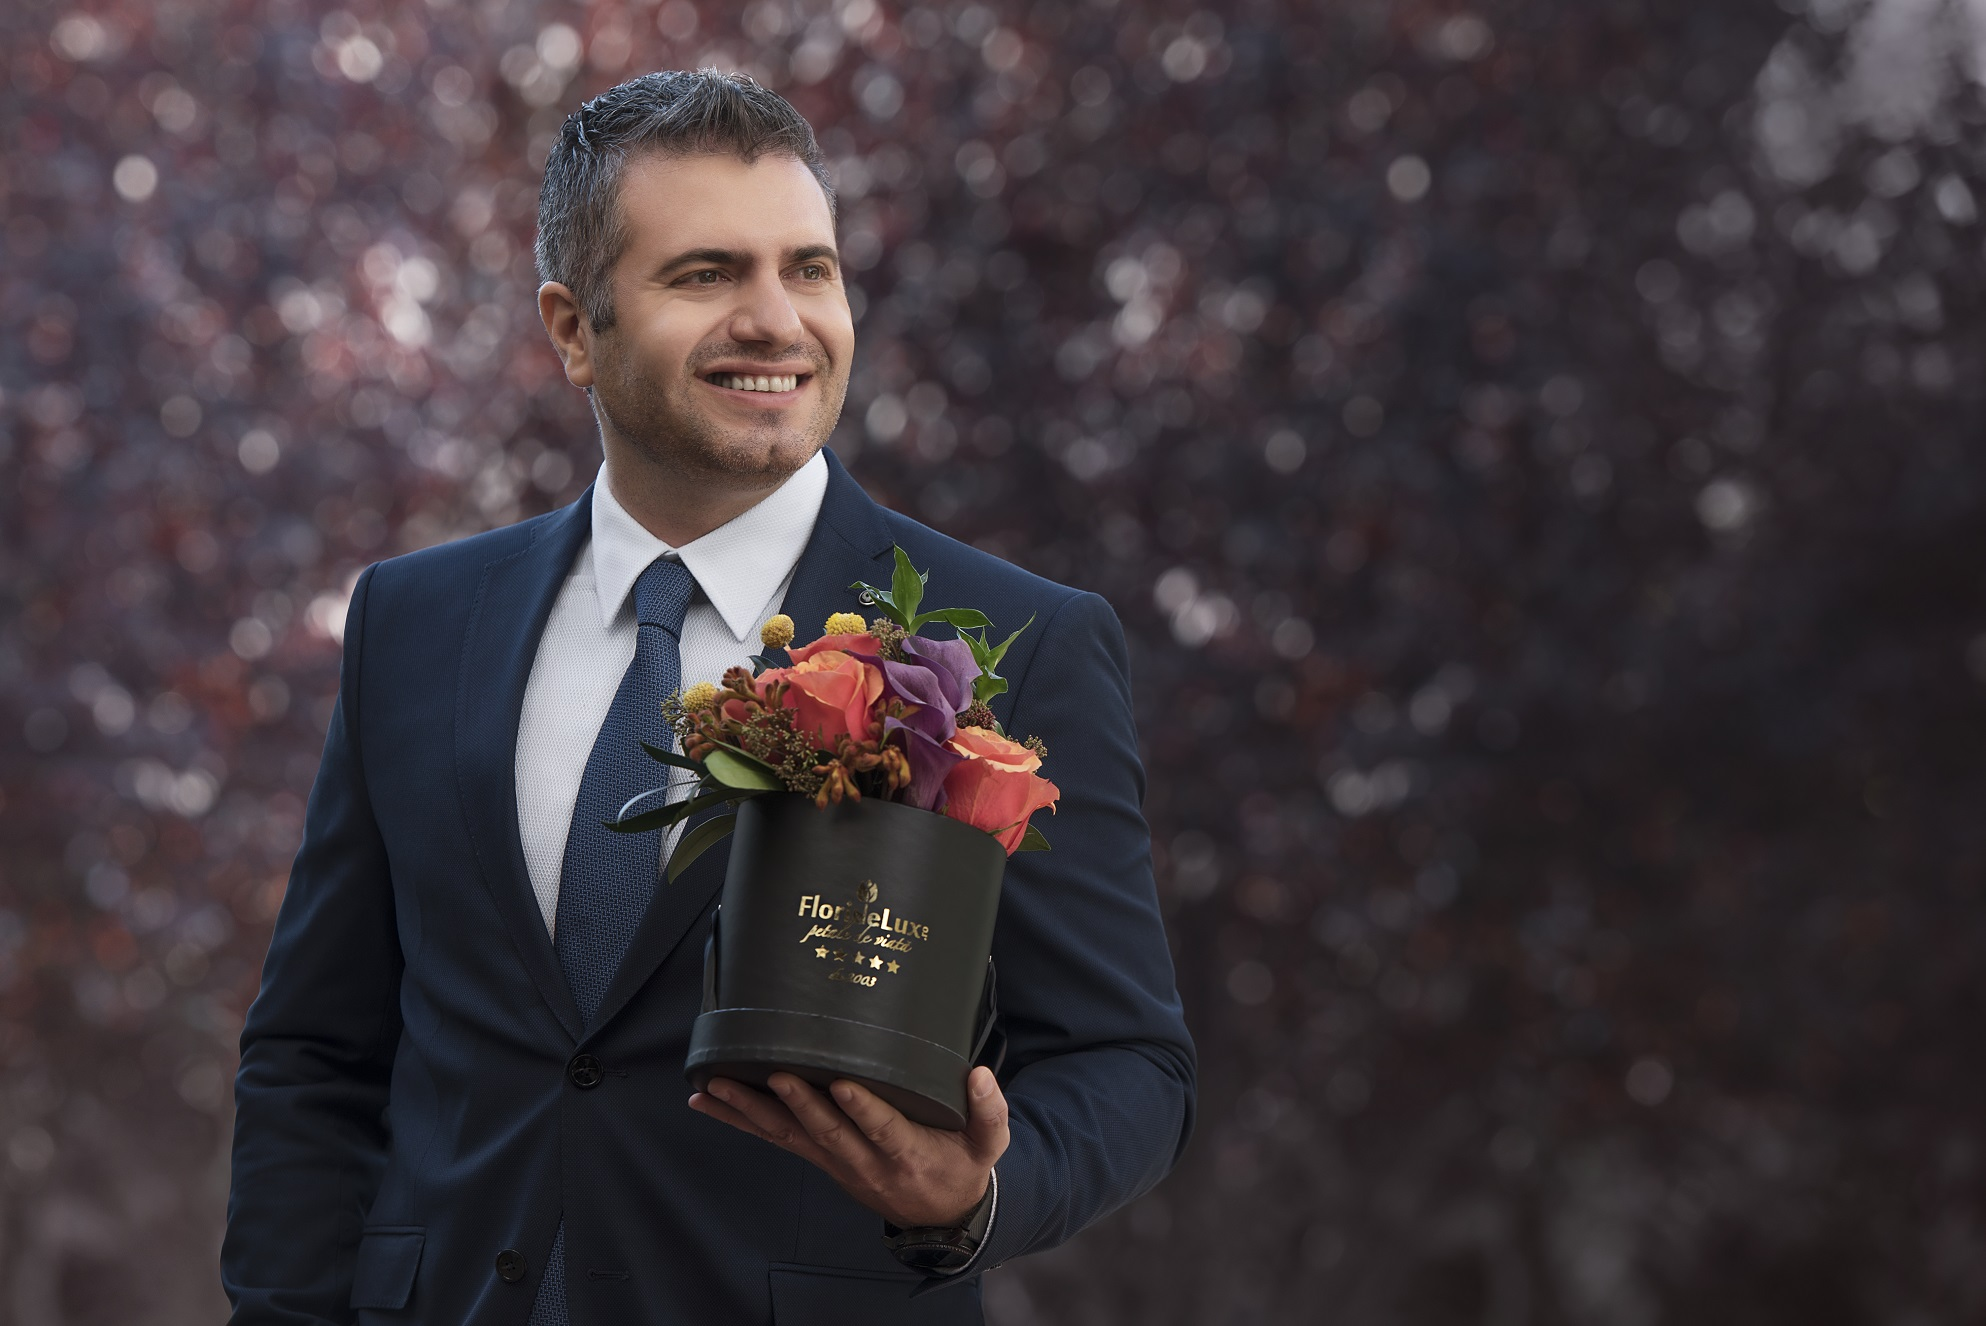 FlorideLux.ro: Vanzarile online de flori vor creste cu 15% in acest an de Valentine's Day